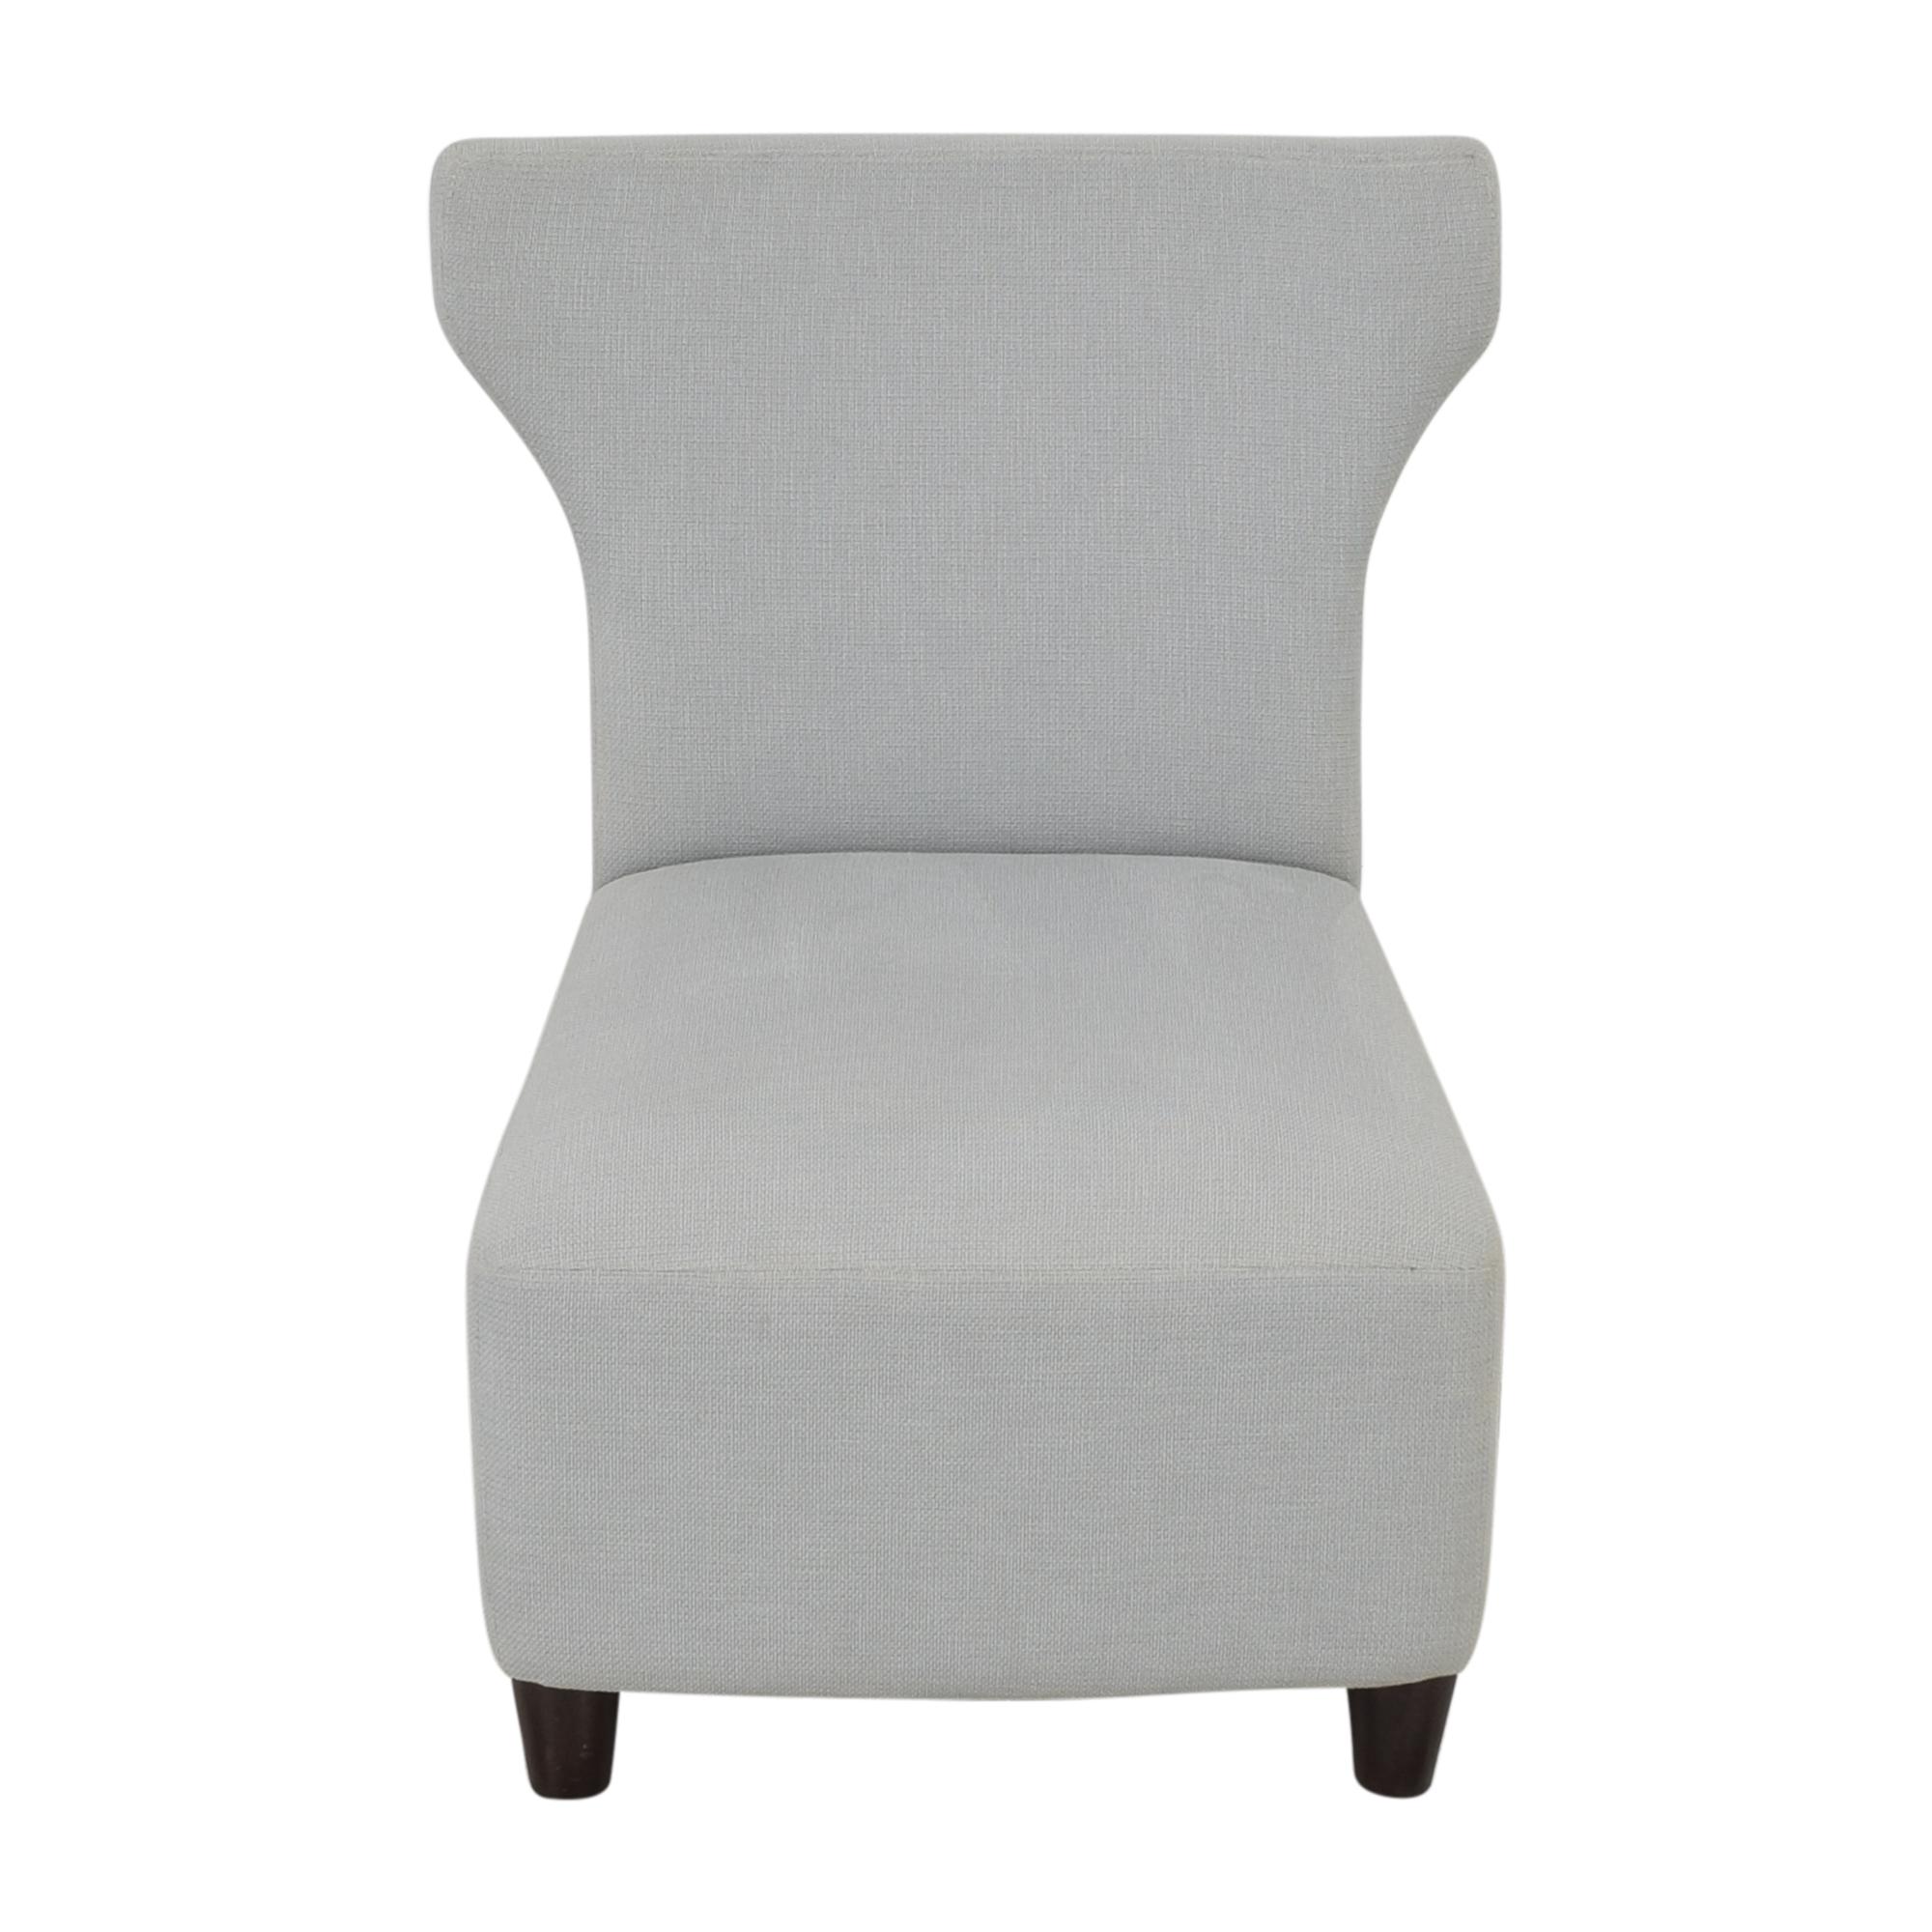 West Elm Modern Sitting Room Chair sale